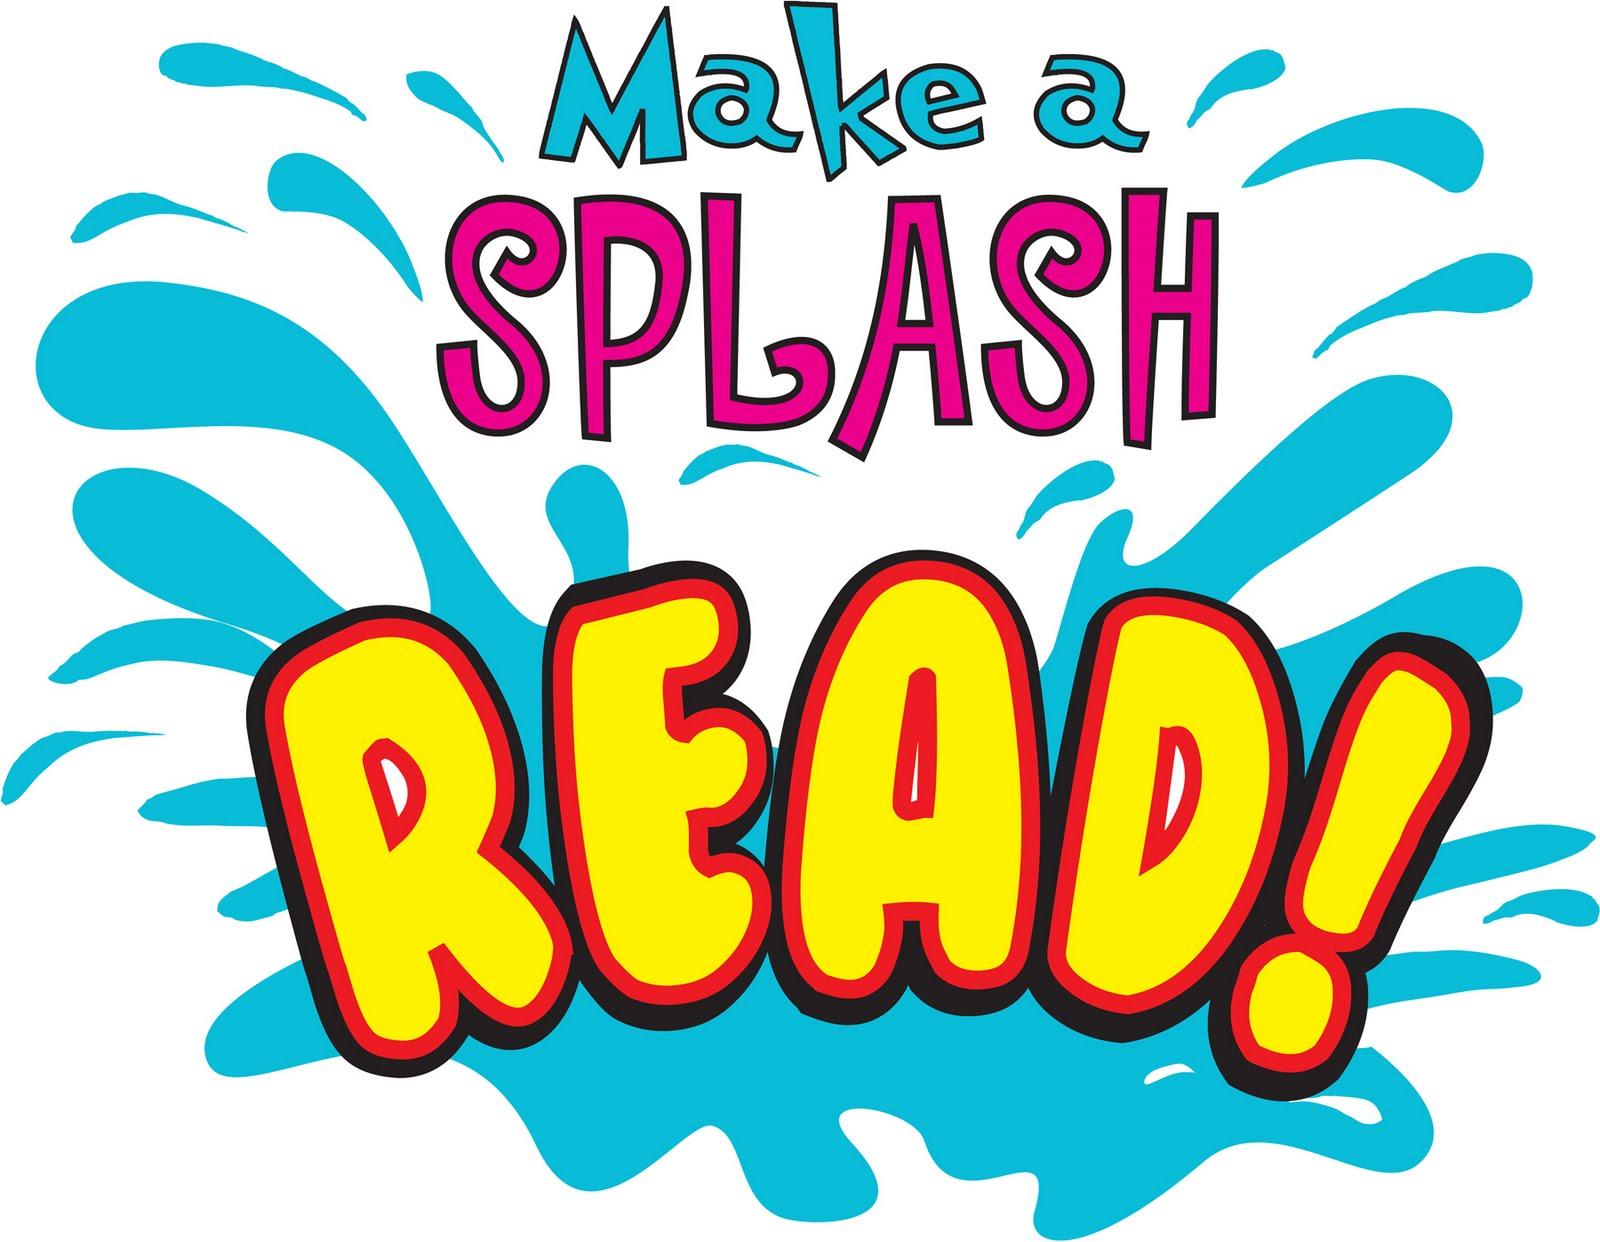 How Do You Promote Summer Reading? - Shepherd's Shining Stars